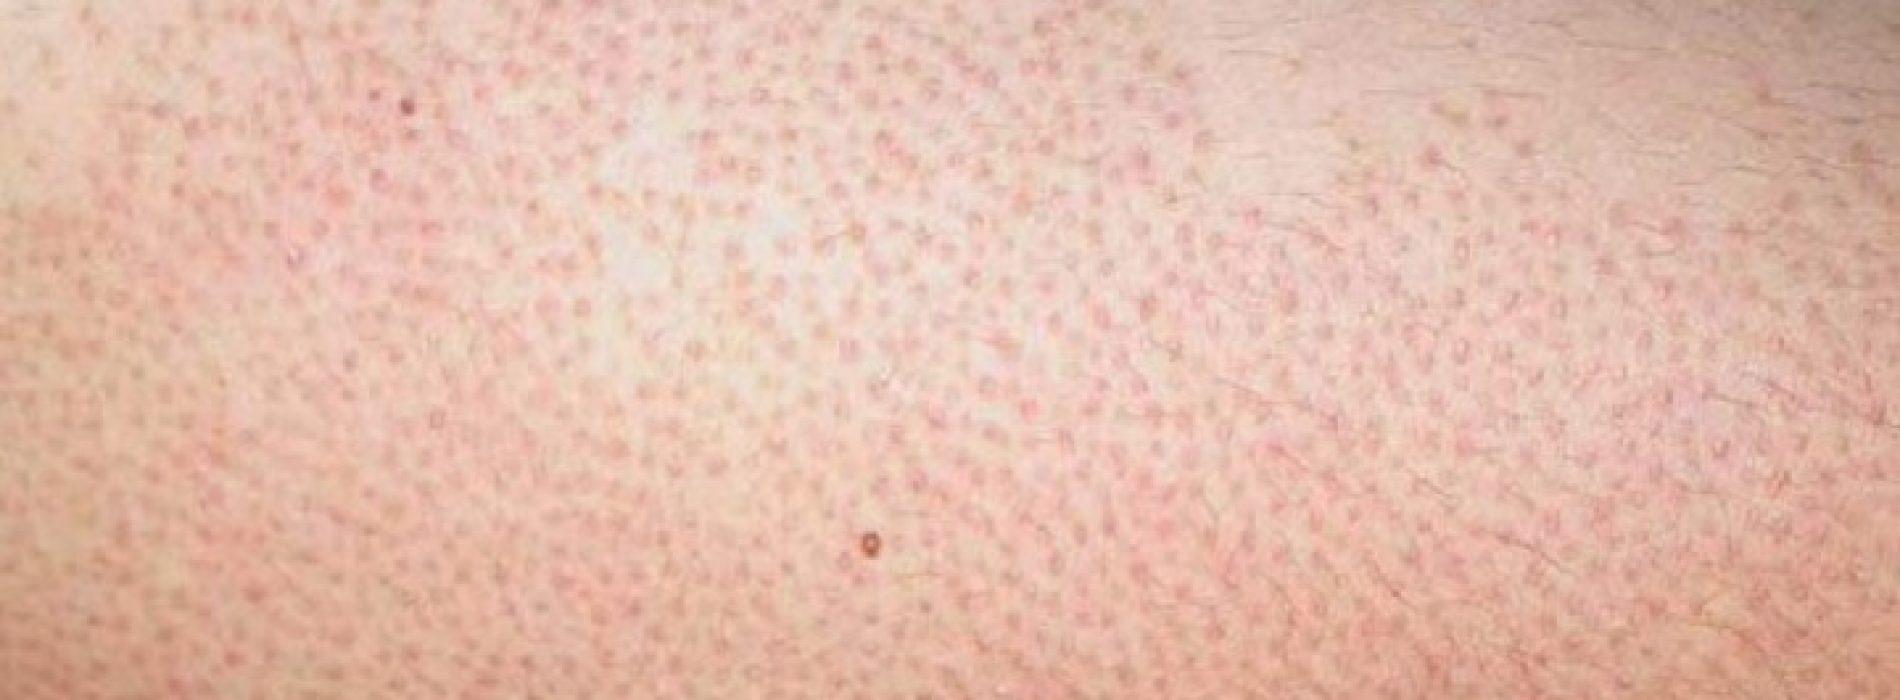 Met DEZE zelfgemaakte peeling kom je snel van die vervelende rode bultjes op je arm af!